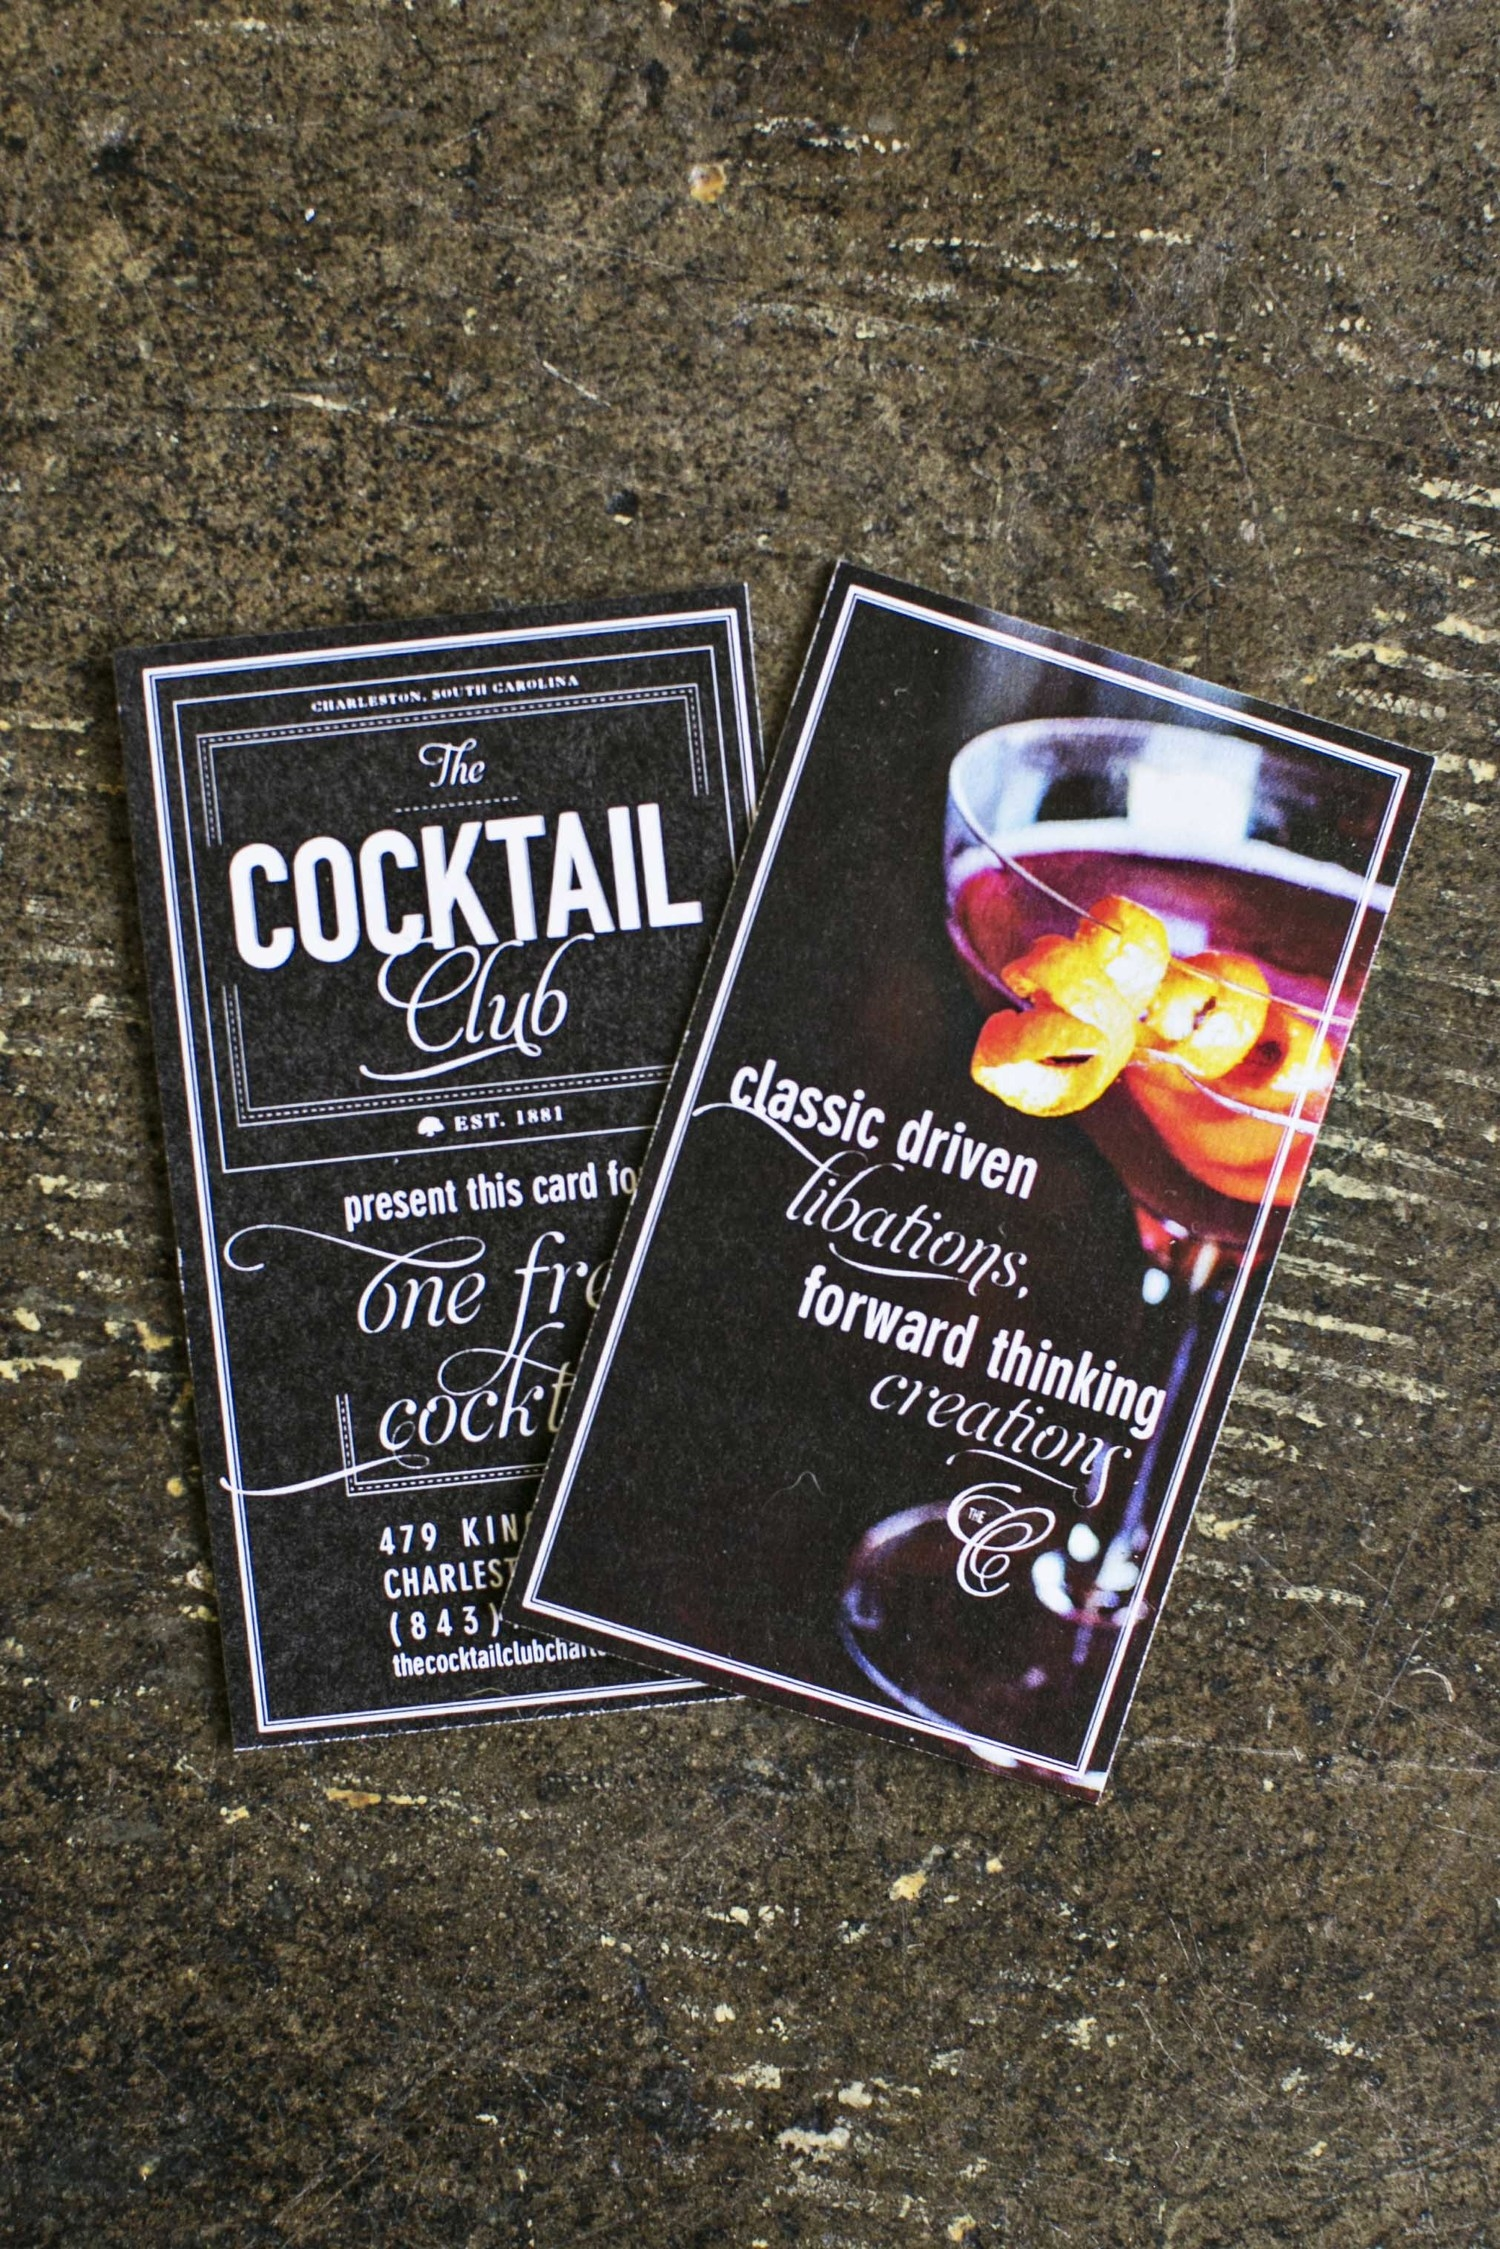 Event: The Cocktail Club, Charleston, SC